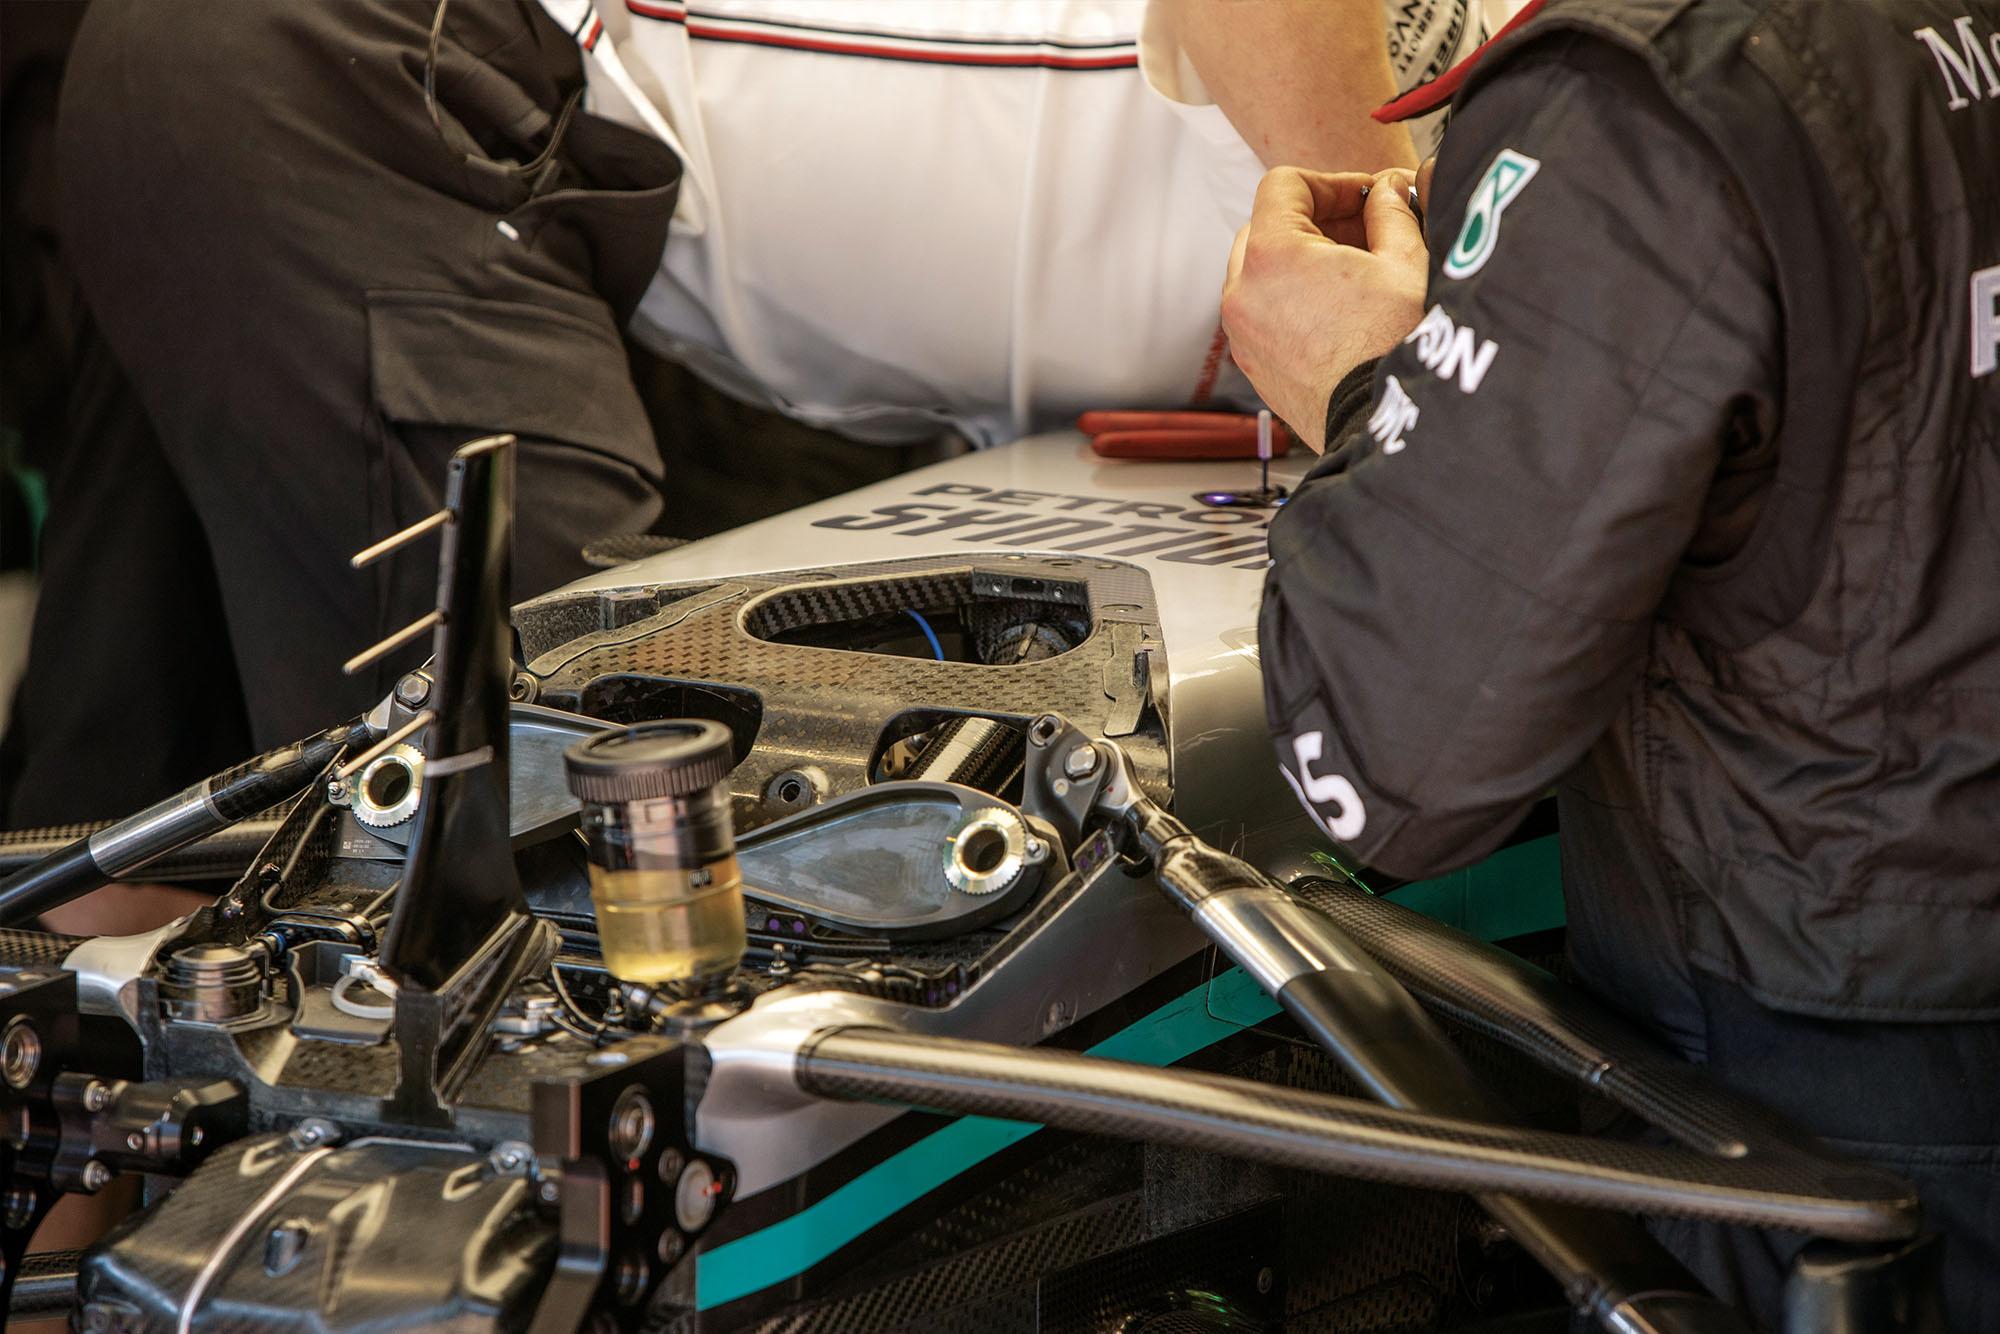 Mercedes F1 DAS